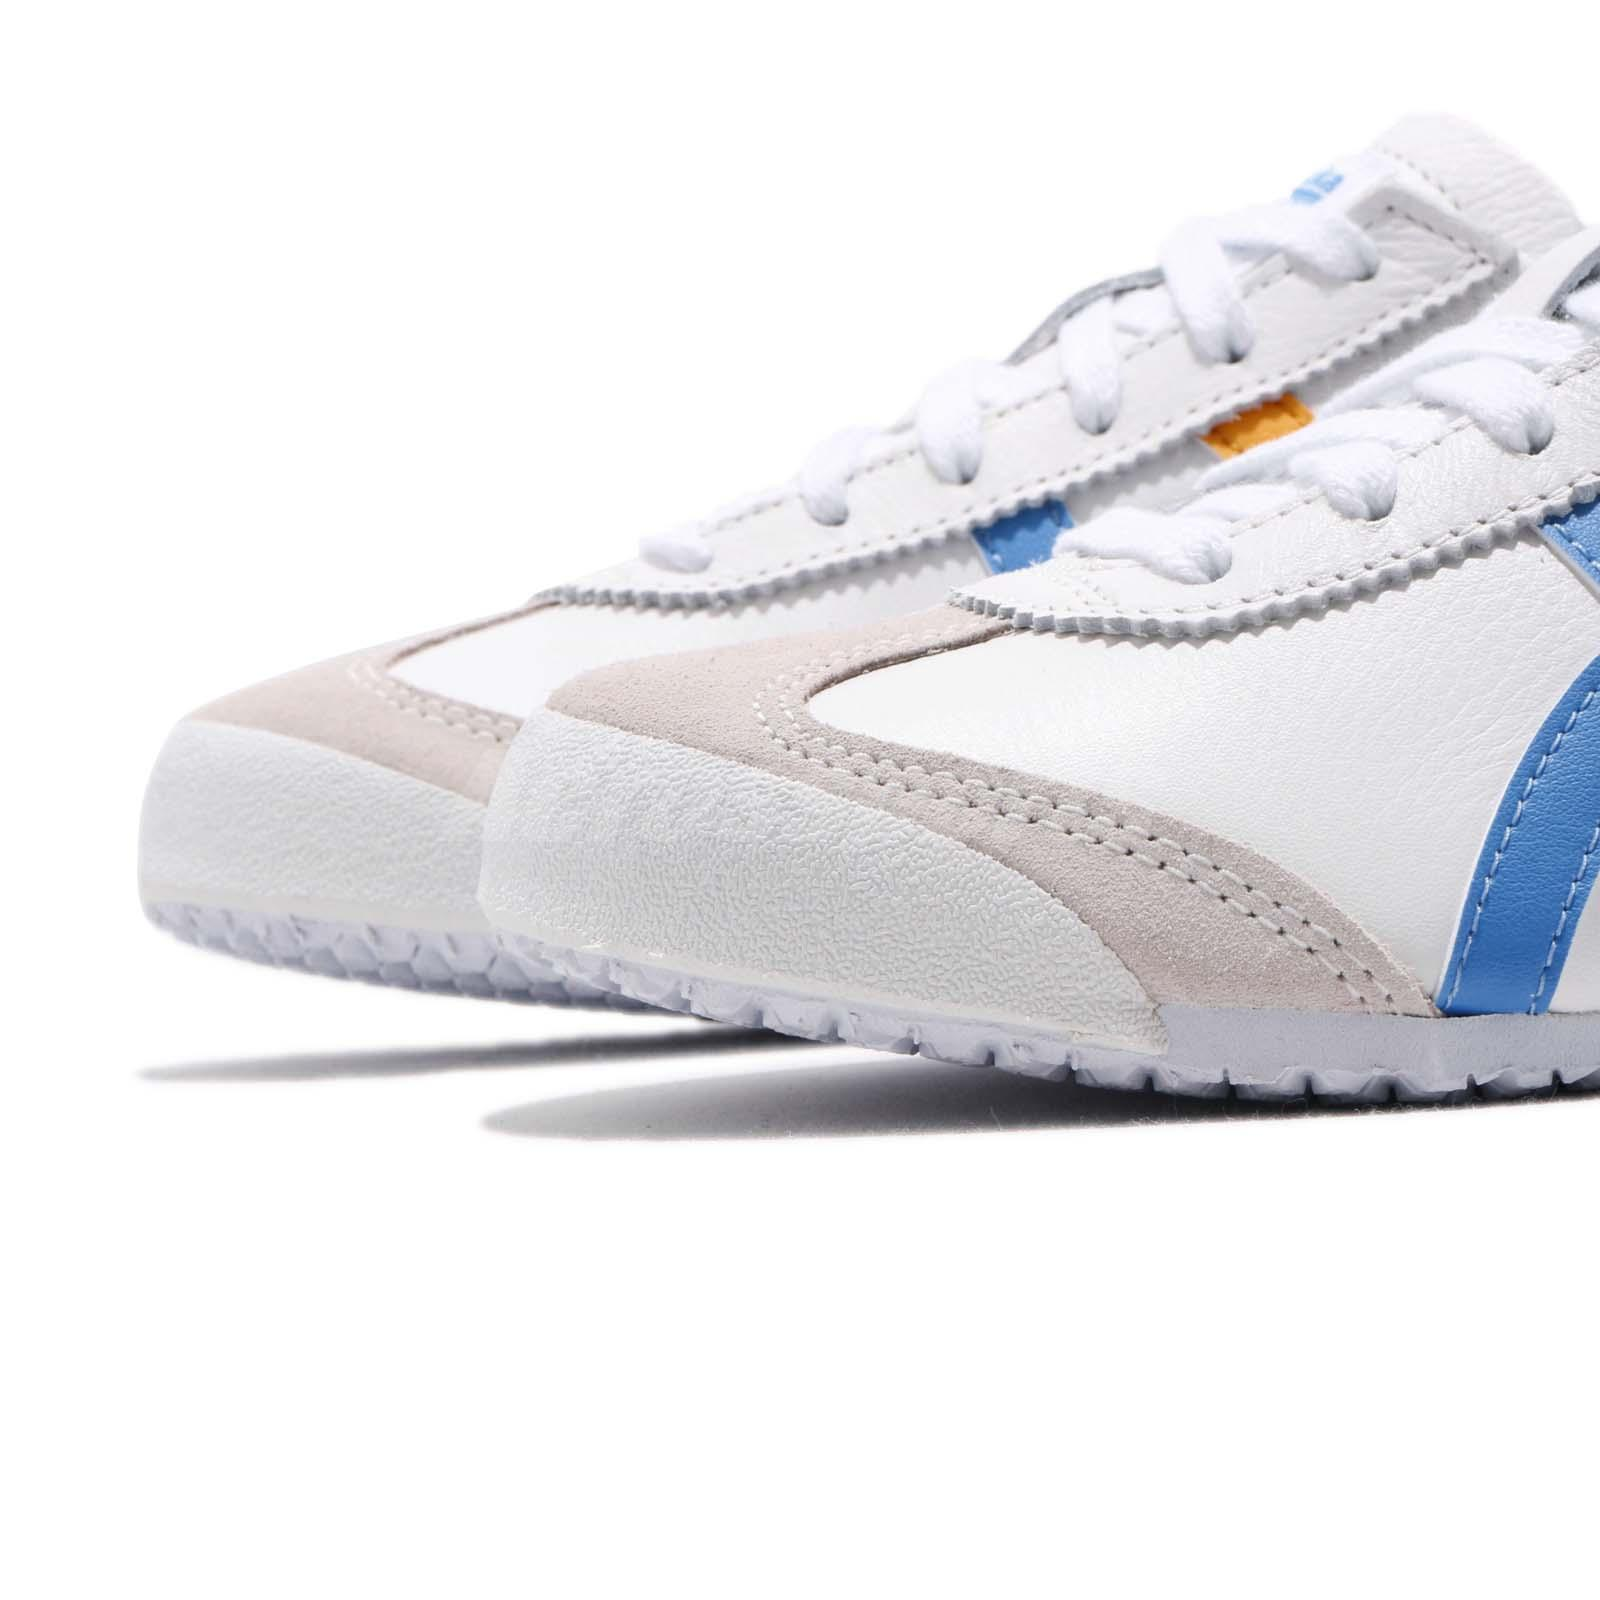 Tiger Blue Women Asics Shoe Mexico White Onitsuka 66 Casual Running kZOPXui